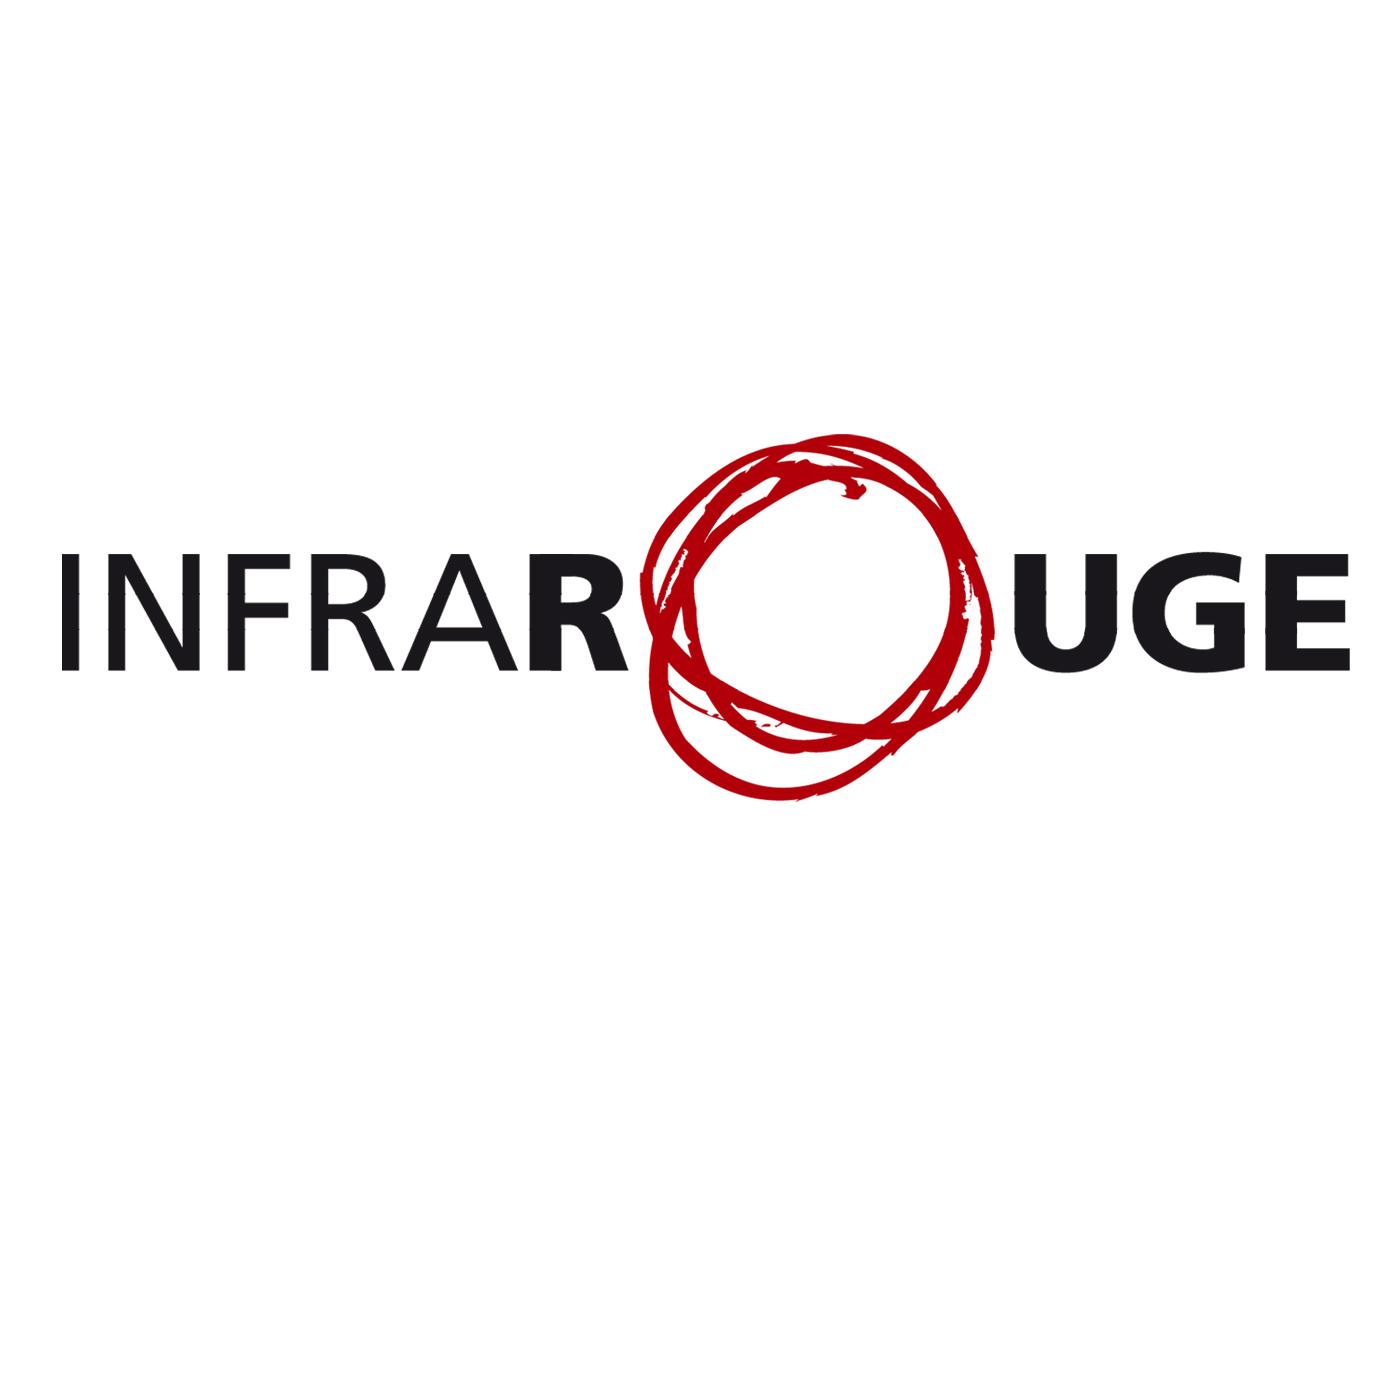 Infrarouge - RTS